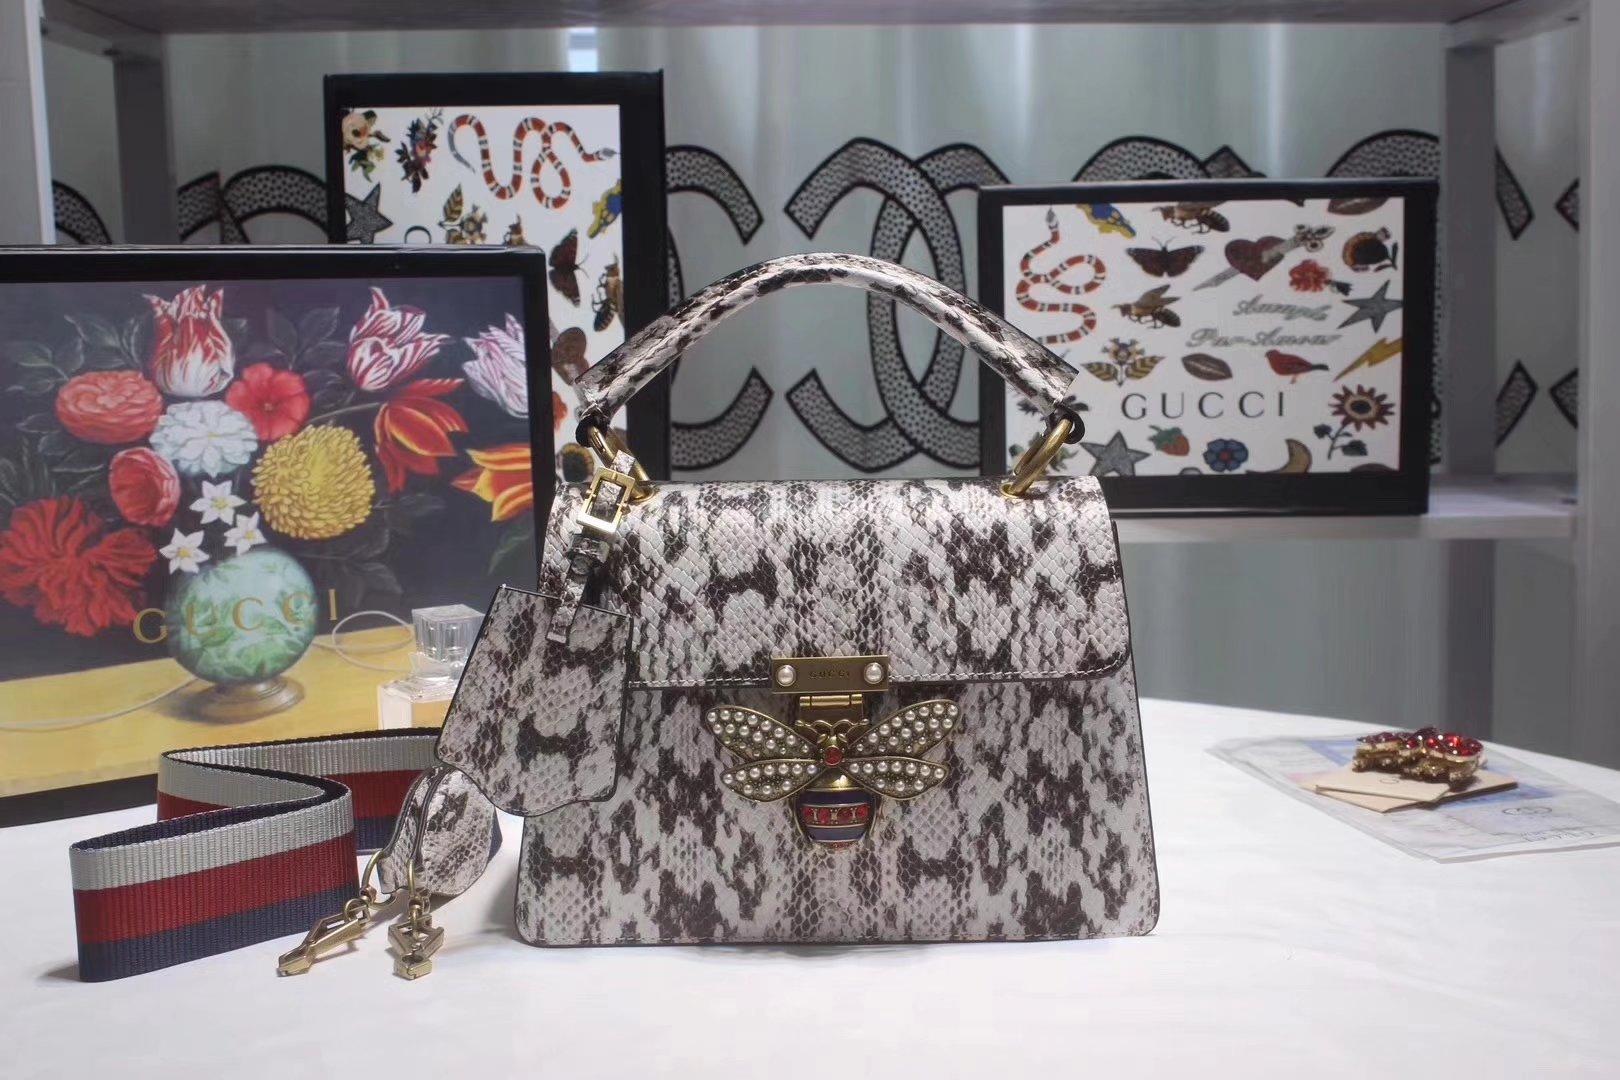 Gucci 476541 Queen Margaret Small Snakeskin Top Handle Bag